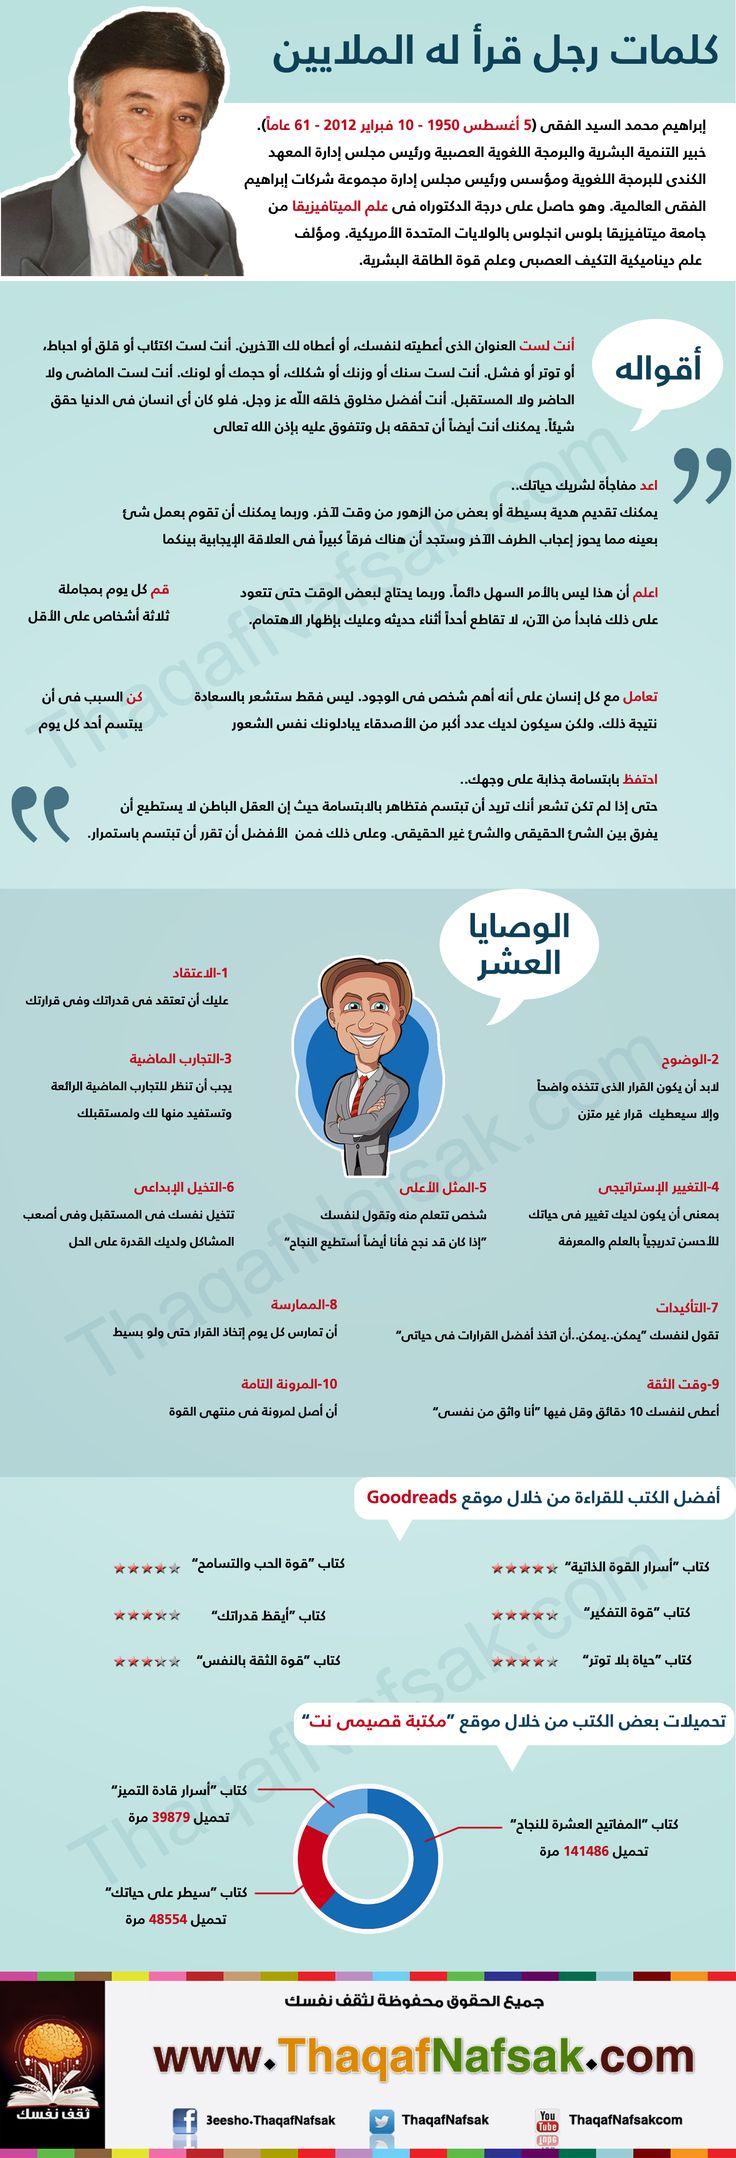 مقولات لدكتور إبراهيم الفقي Learning Websites Positive Notes Cool Words